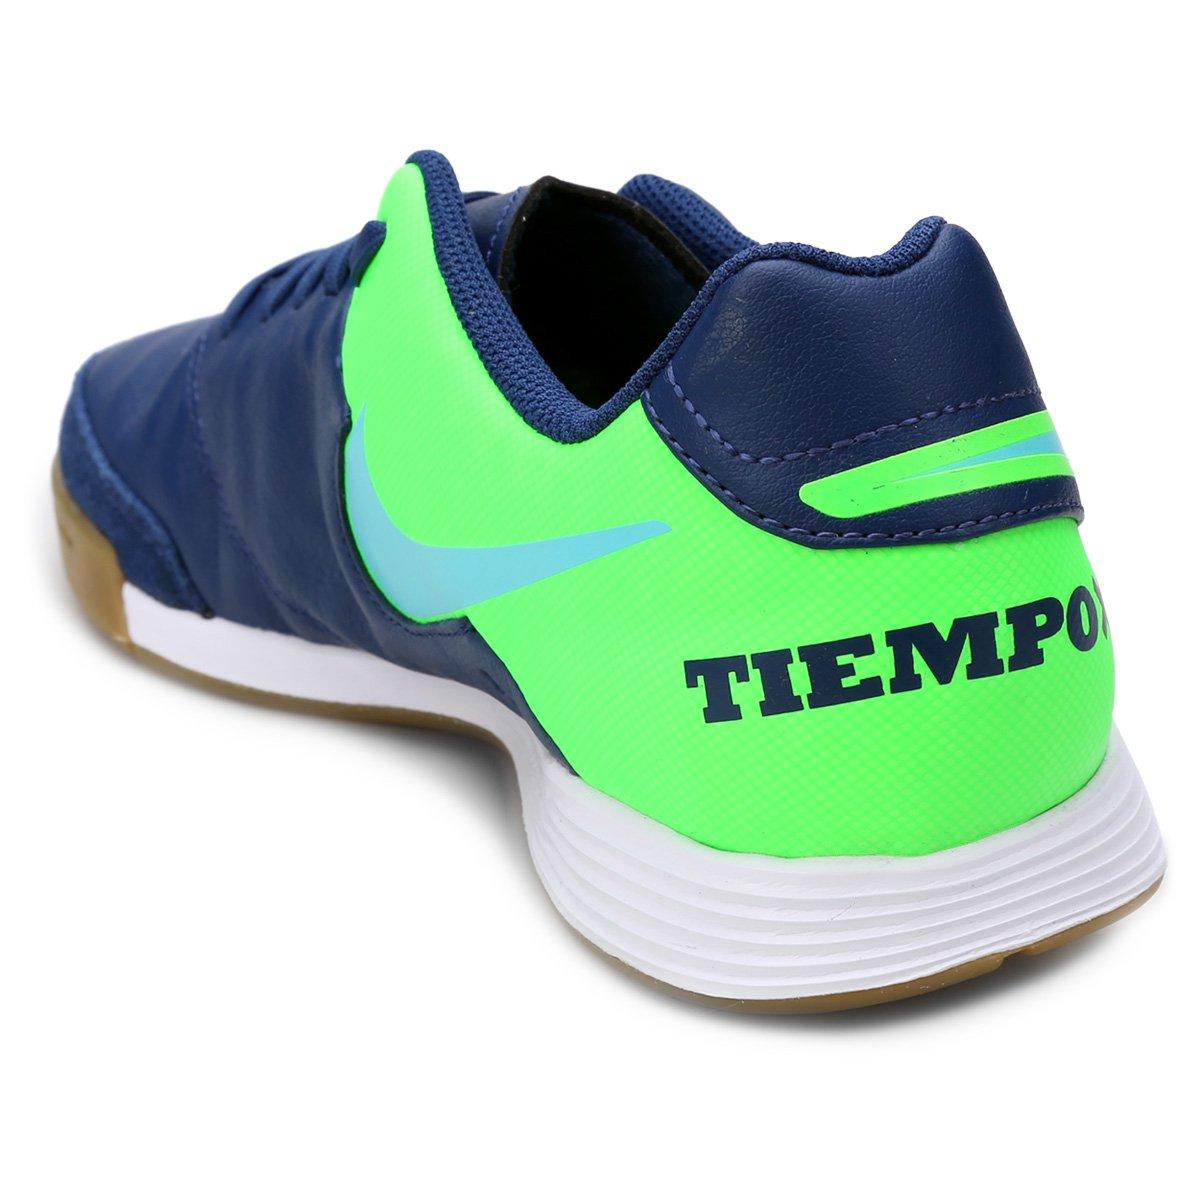 995b7e3656 Chuteira Futsal Nike Tiempo Genio 2 Leather IC - Compre Agora